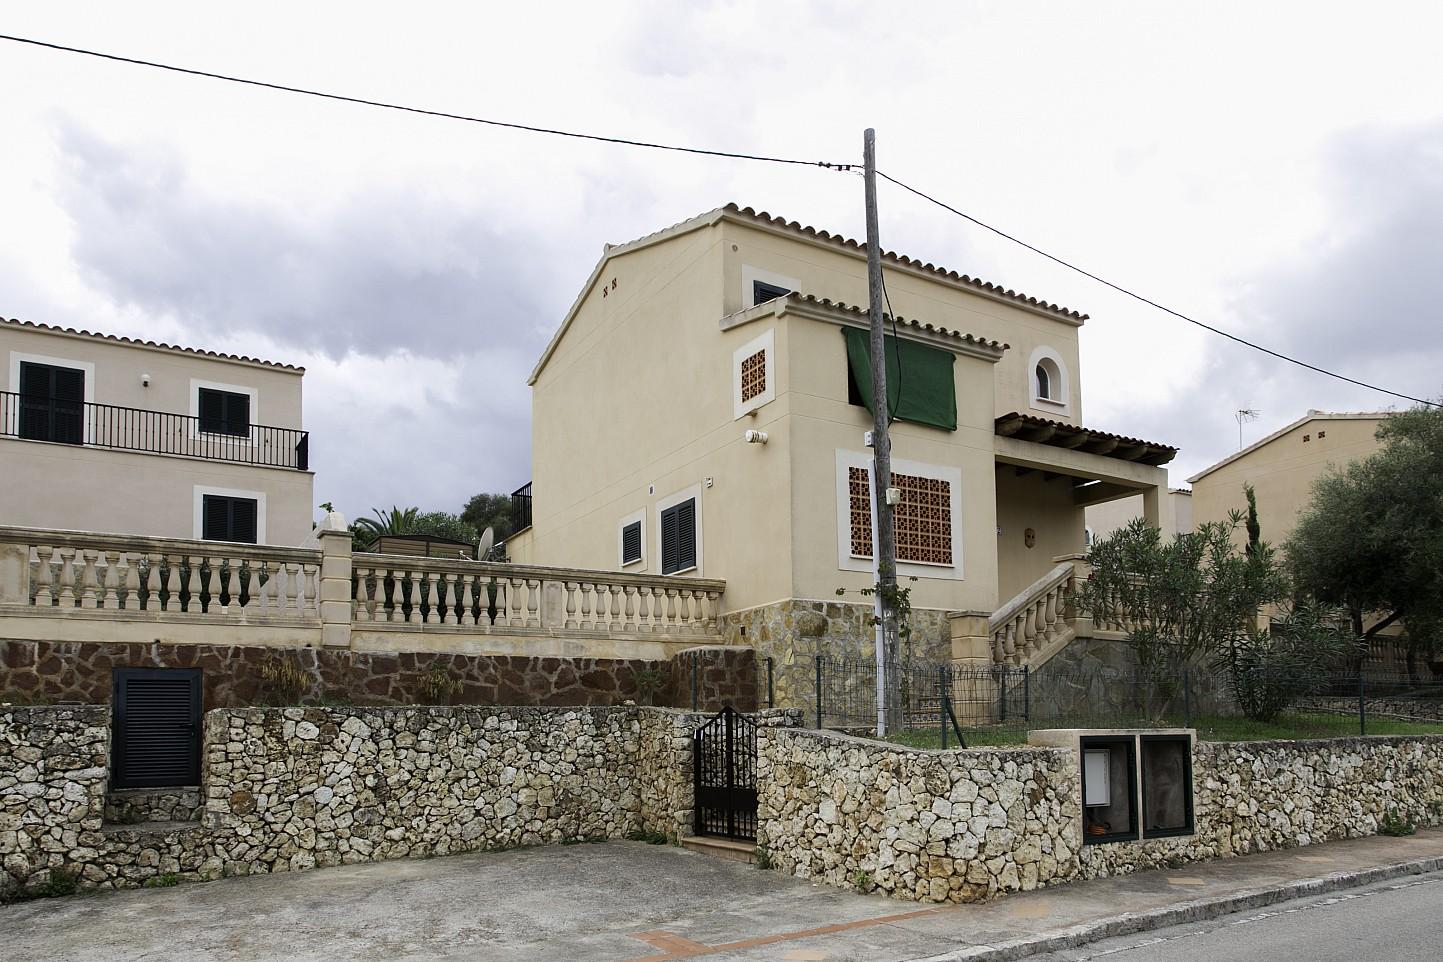 Alrededores de bonita casa en venta en Urb. Villas de Cala Romántica en Mallorca